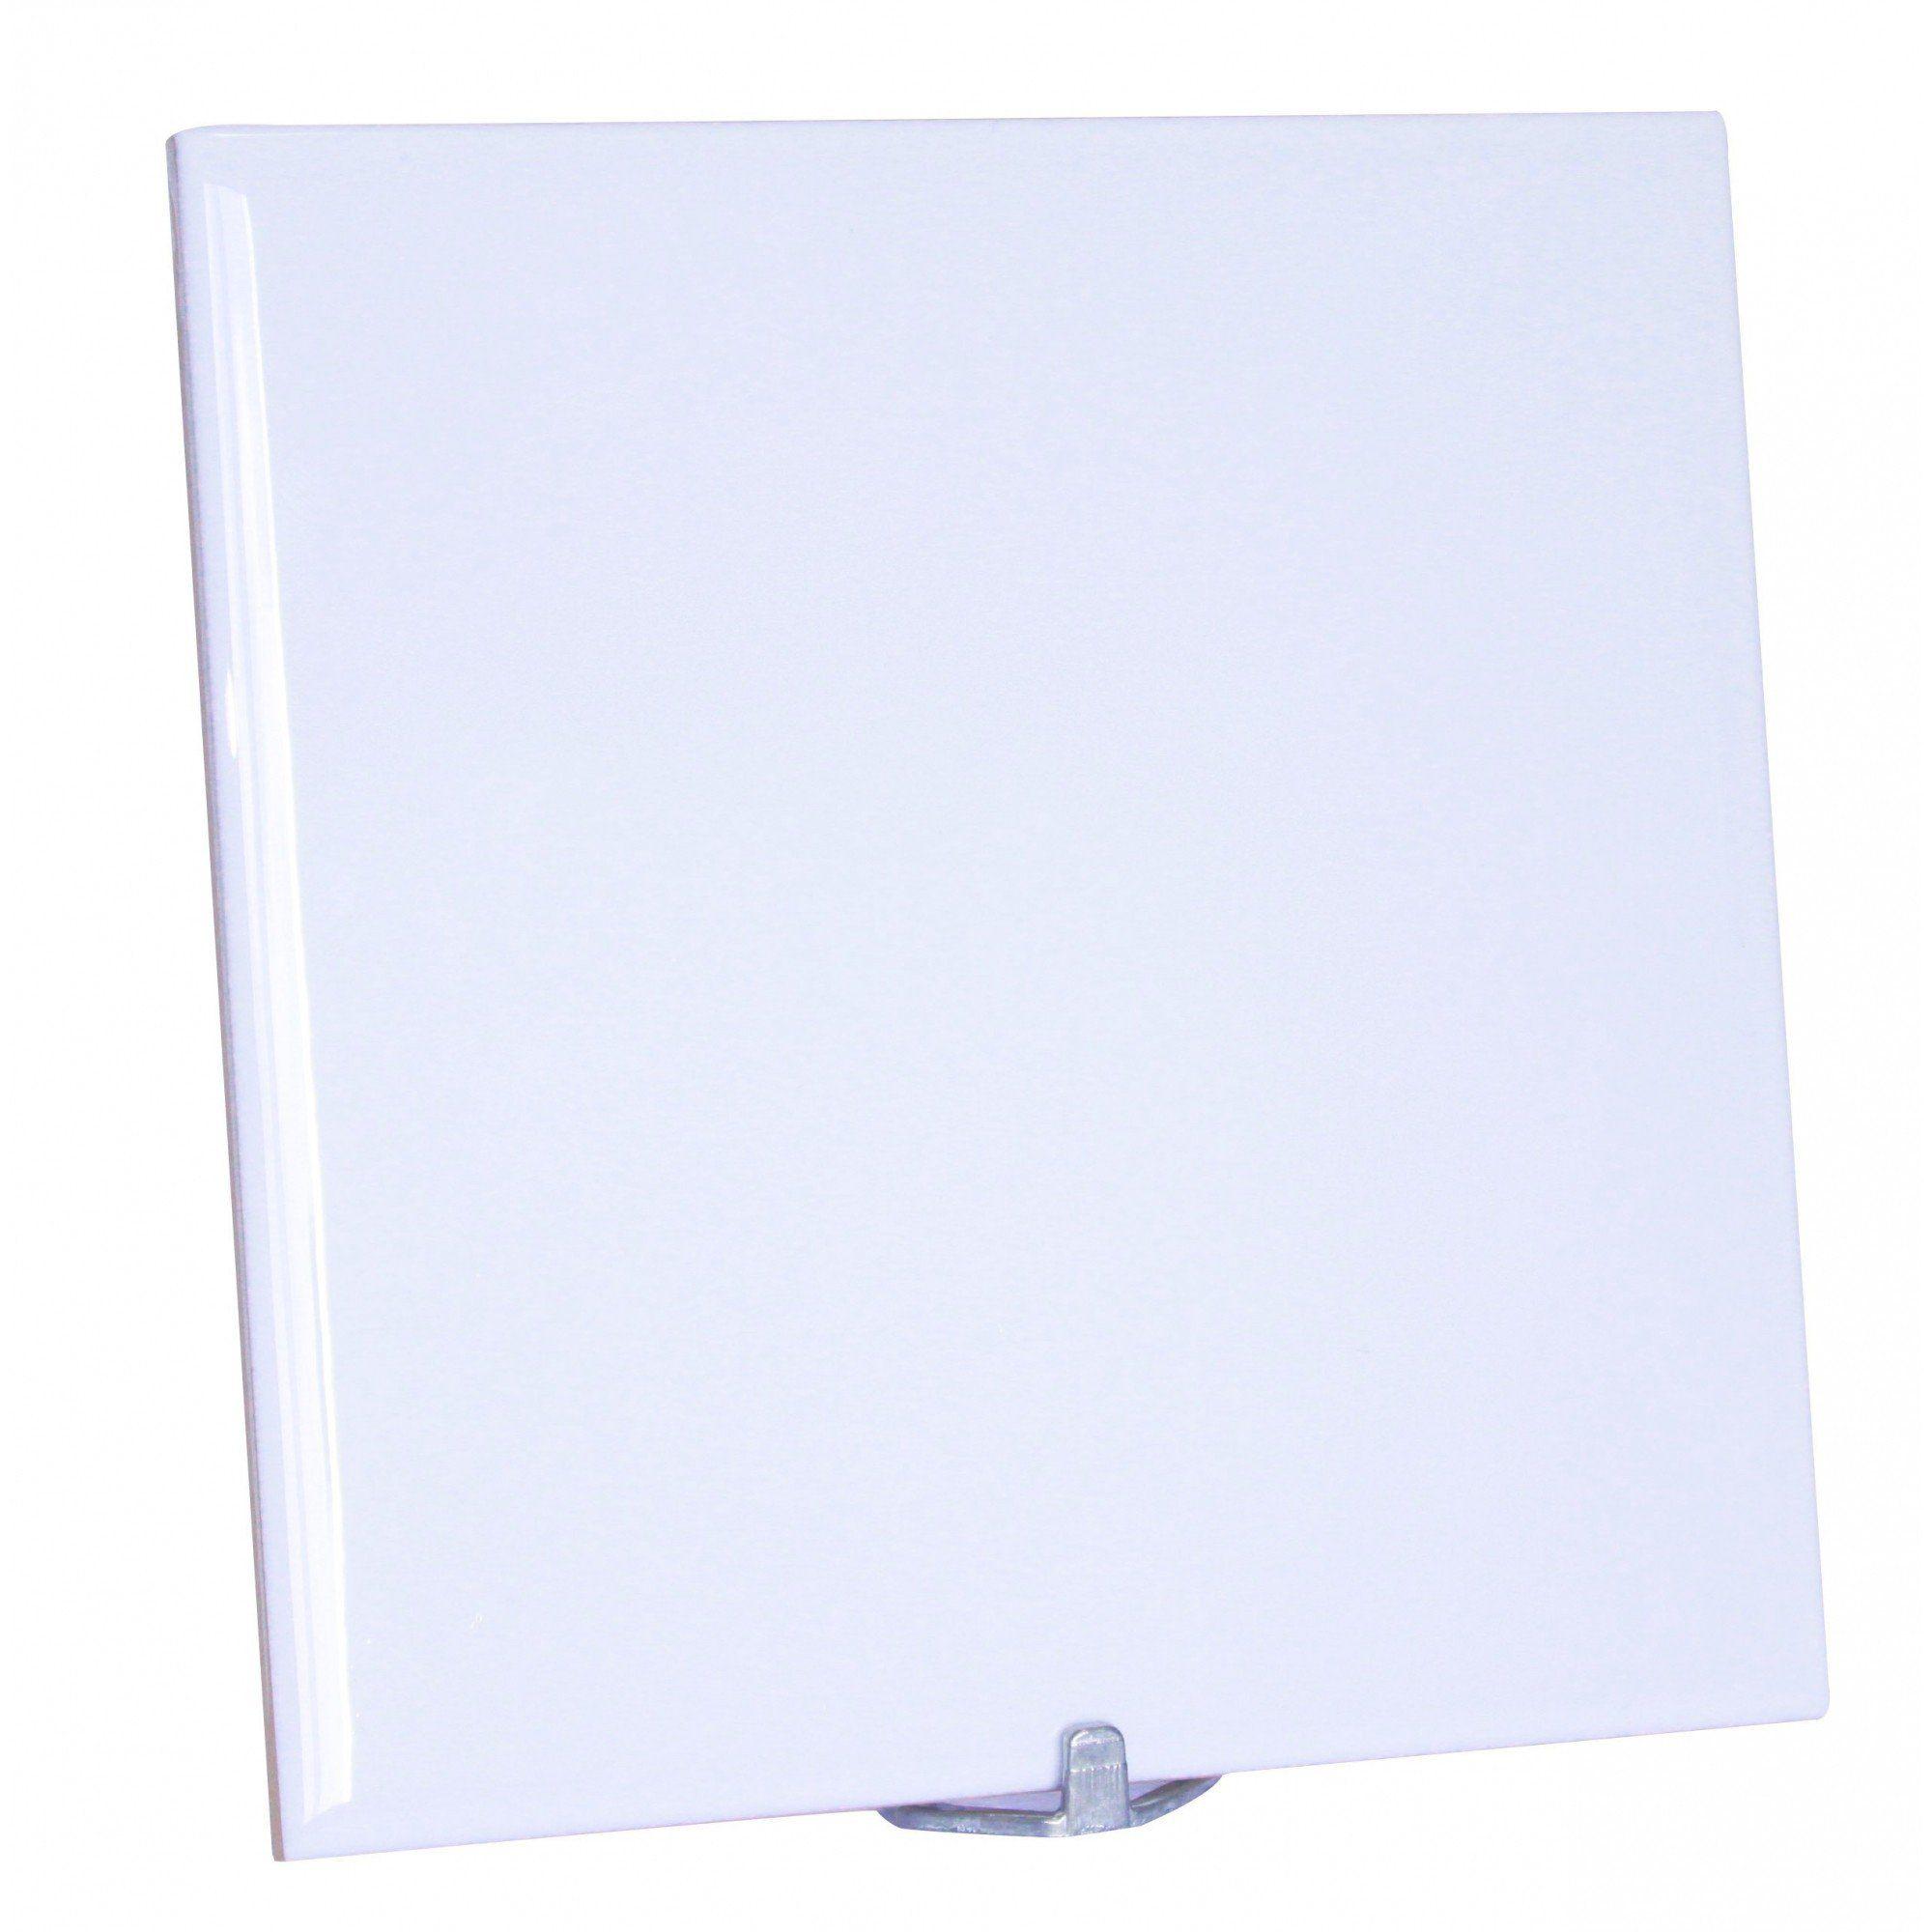 Azulejo 15x15 Branco Pérola